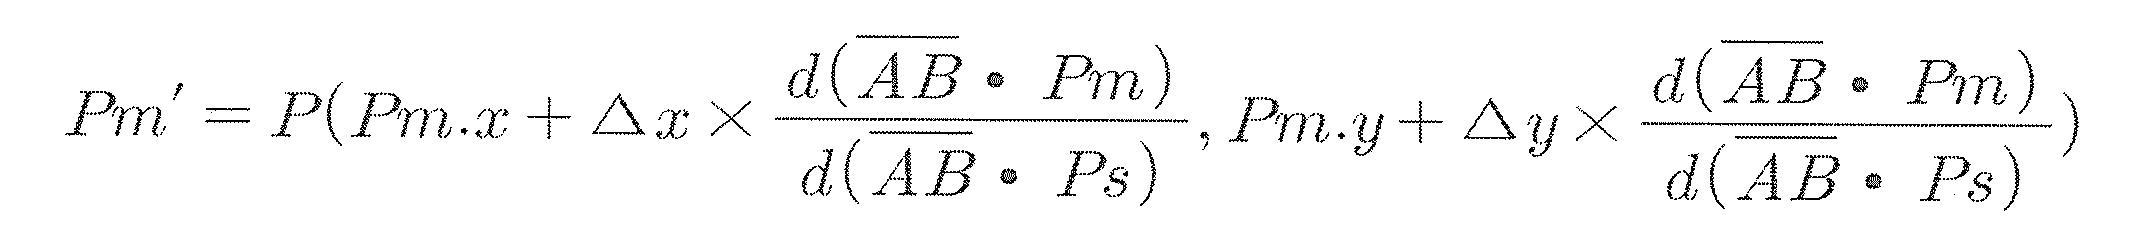 Figure 112011032804328-pat00009